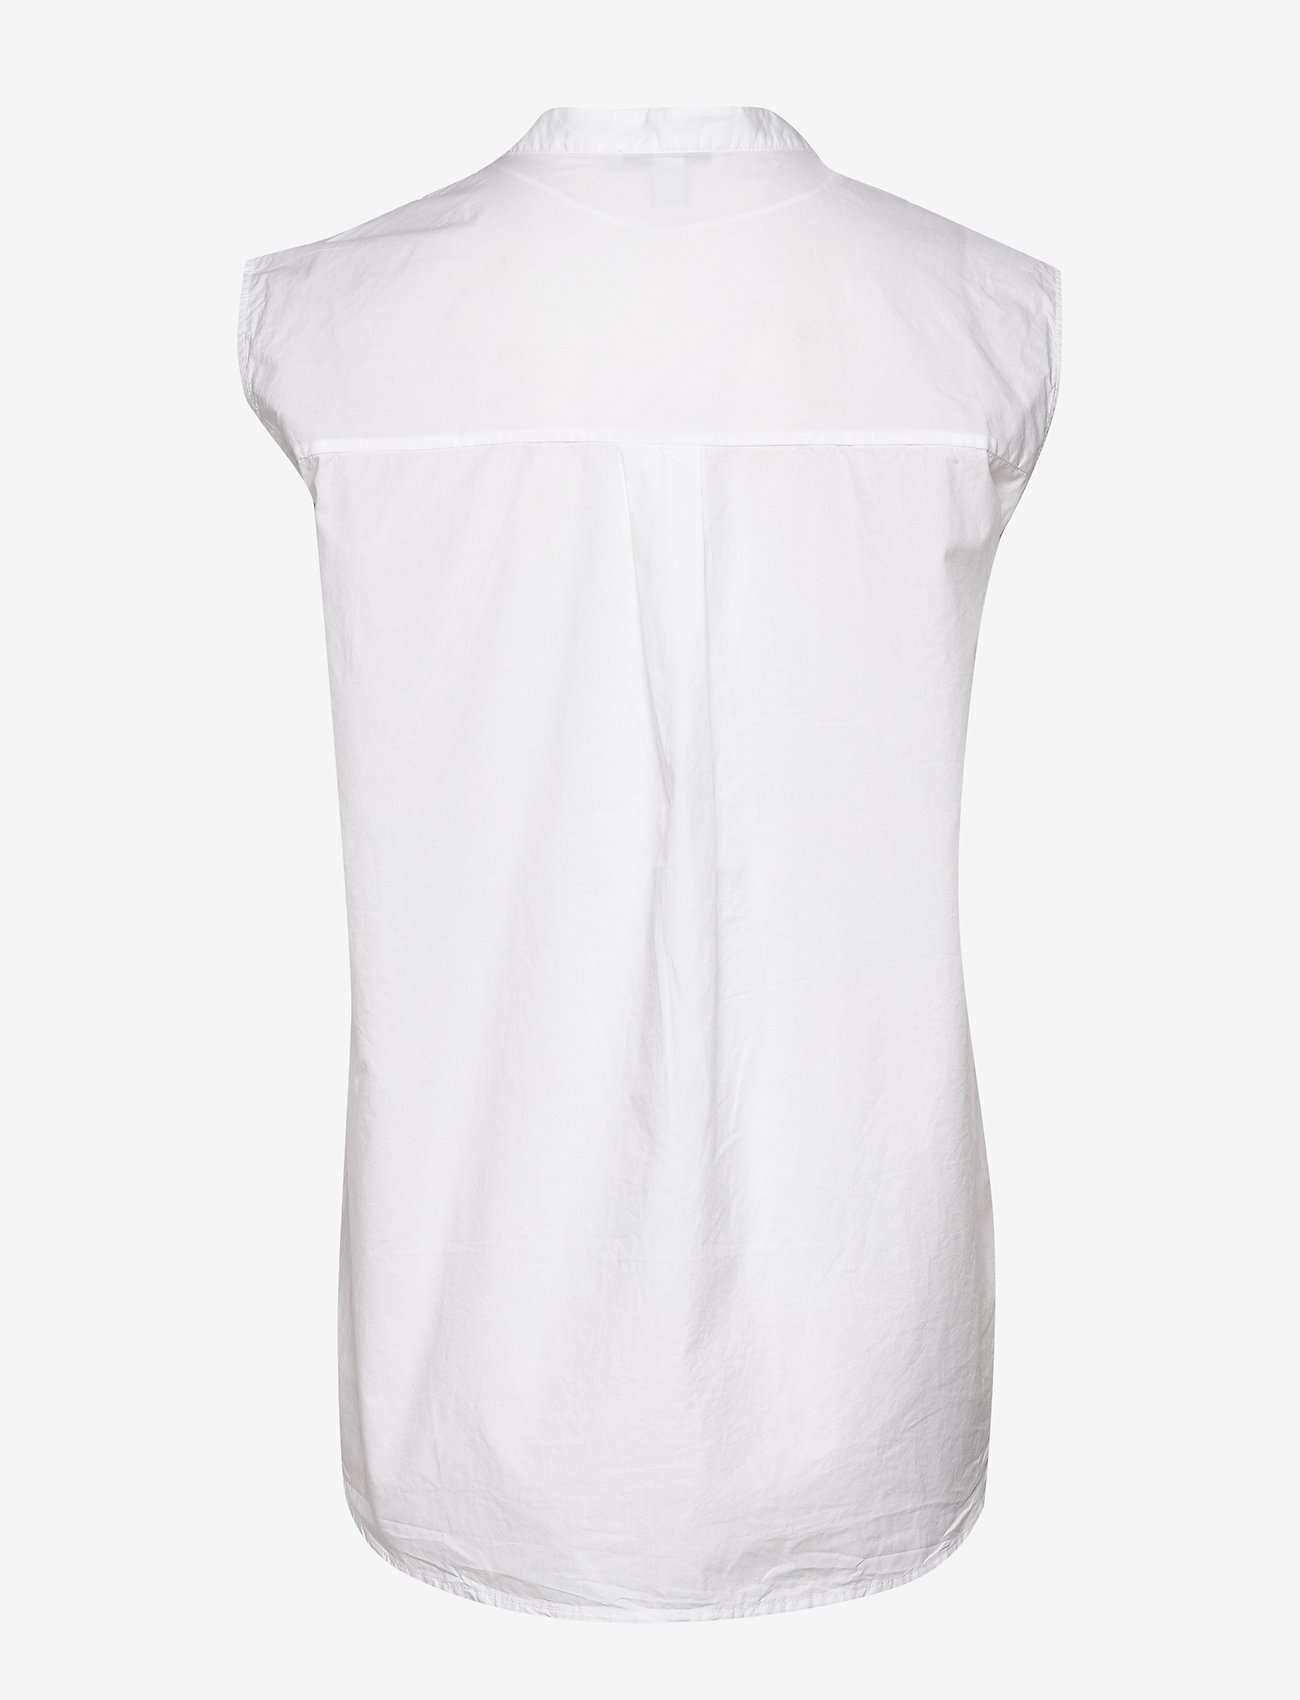 Esprit Casual Blouses Woven - & Shirts